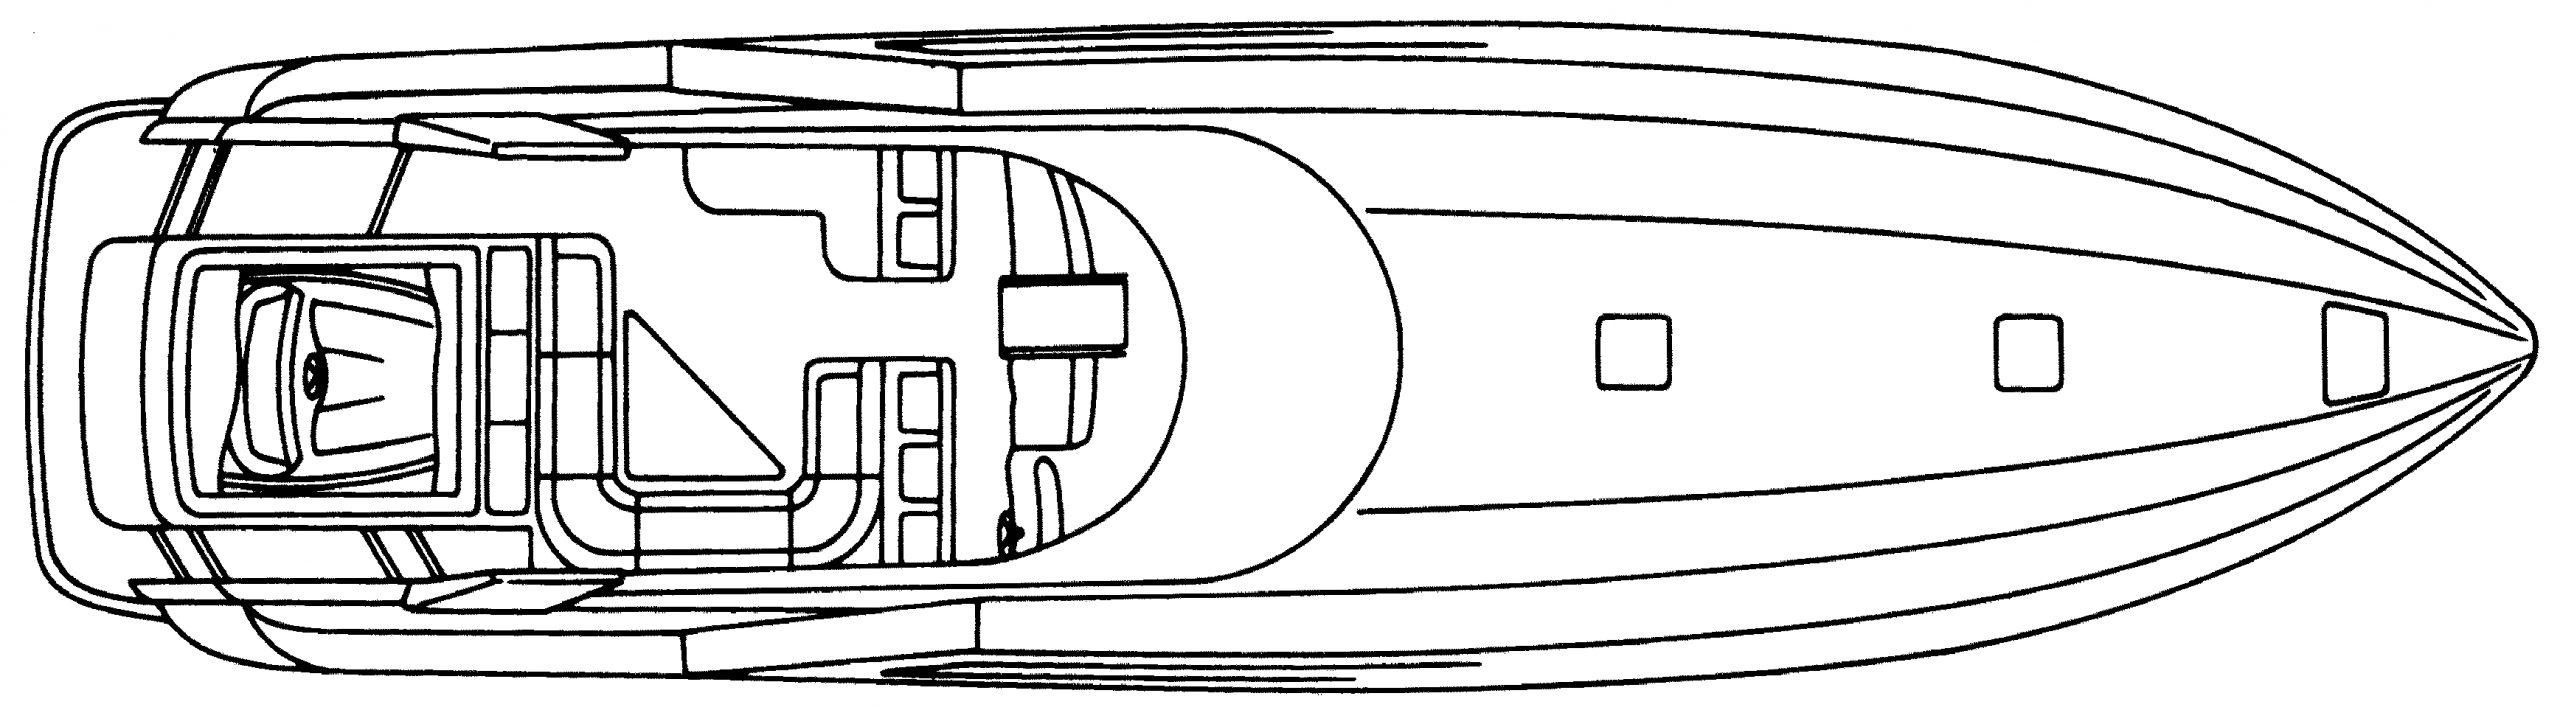 Predator 63 Floor Plan 2